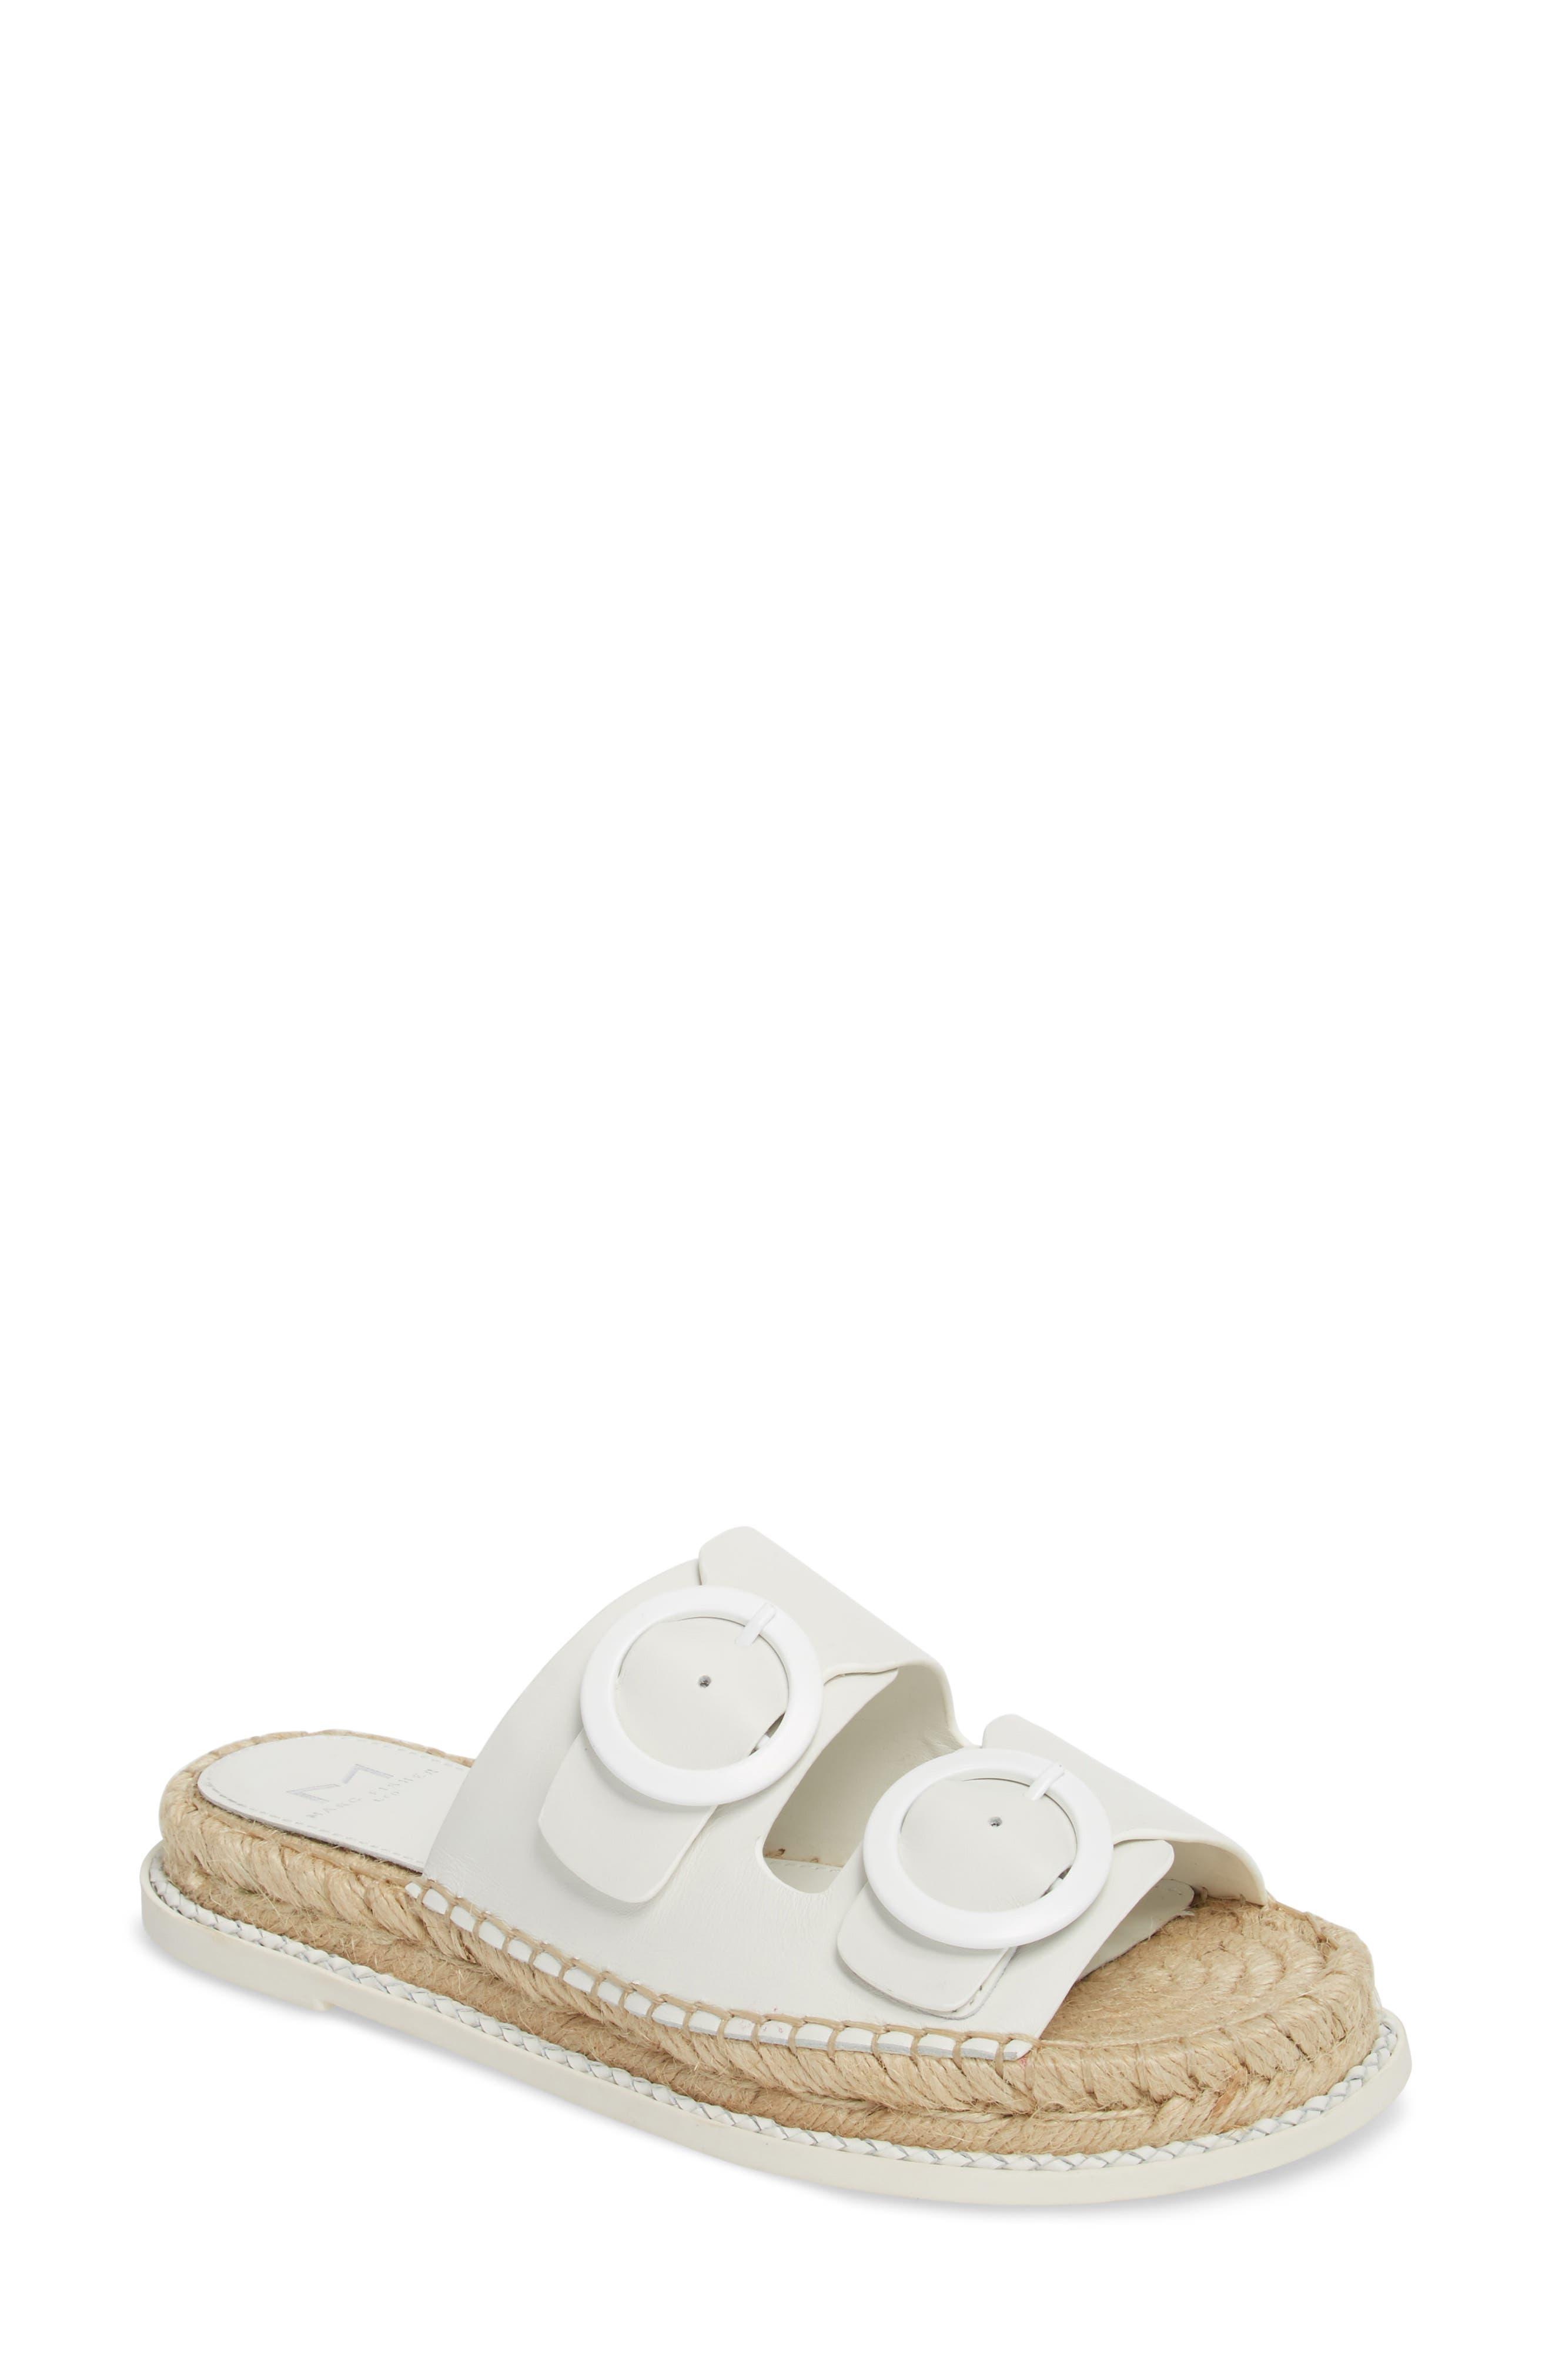 Ramba Espadrille Slide Sandal,                             Main thumbnail 1, color,                             White Leather